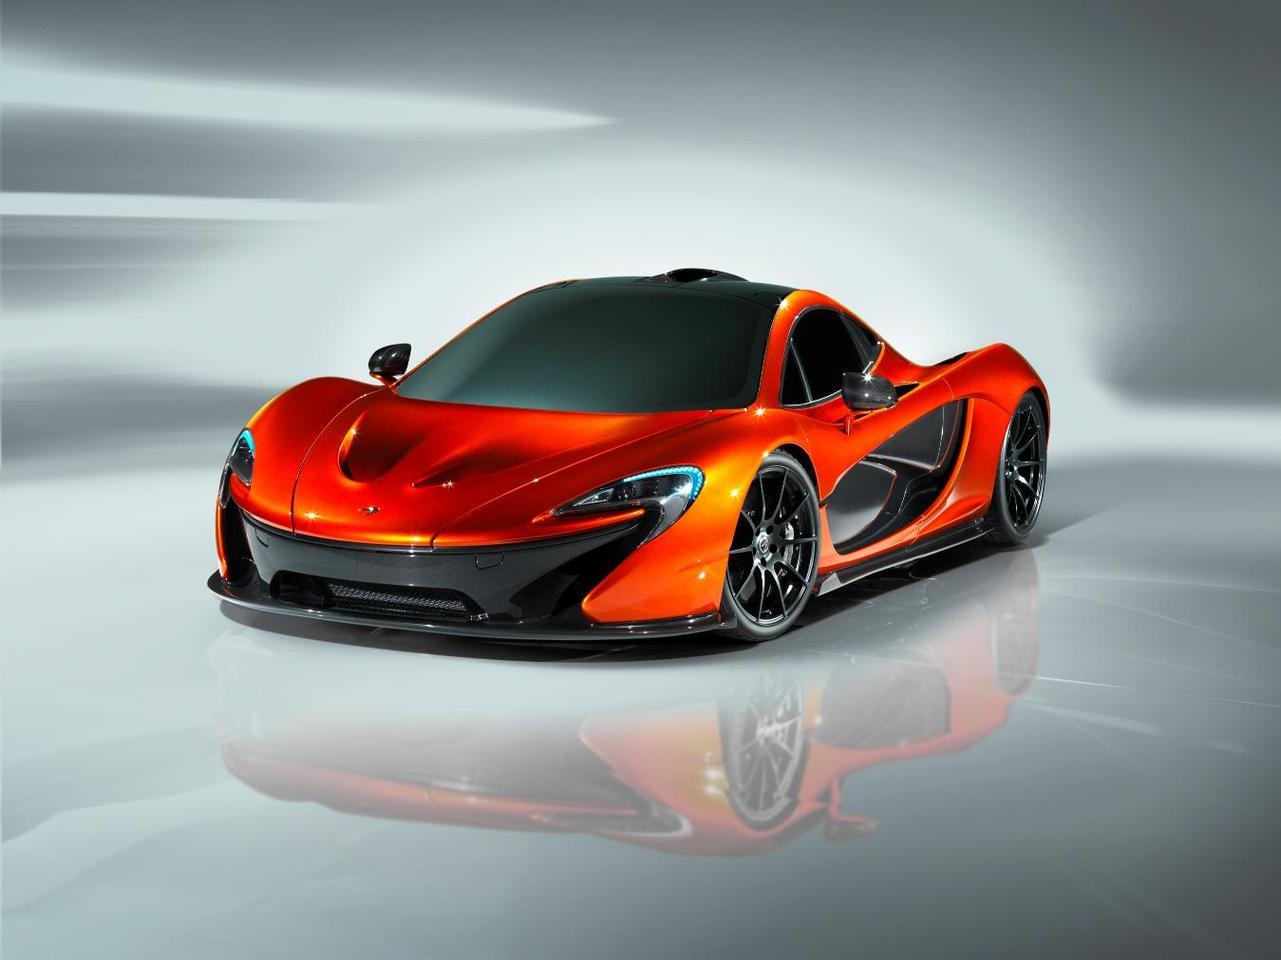 The McLaren P1 will hit the market next year